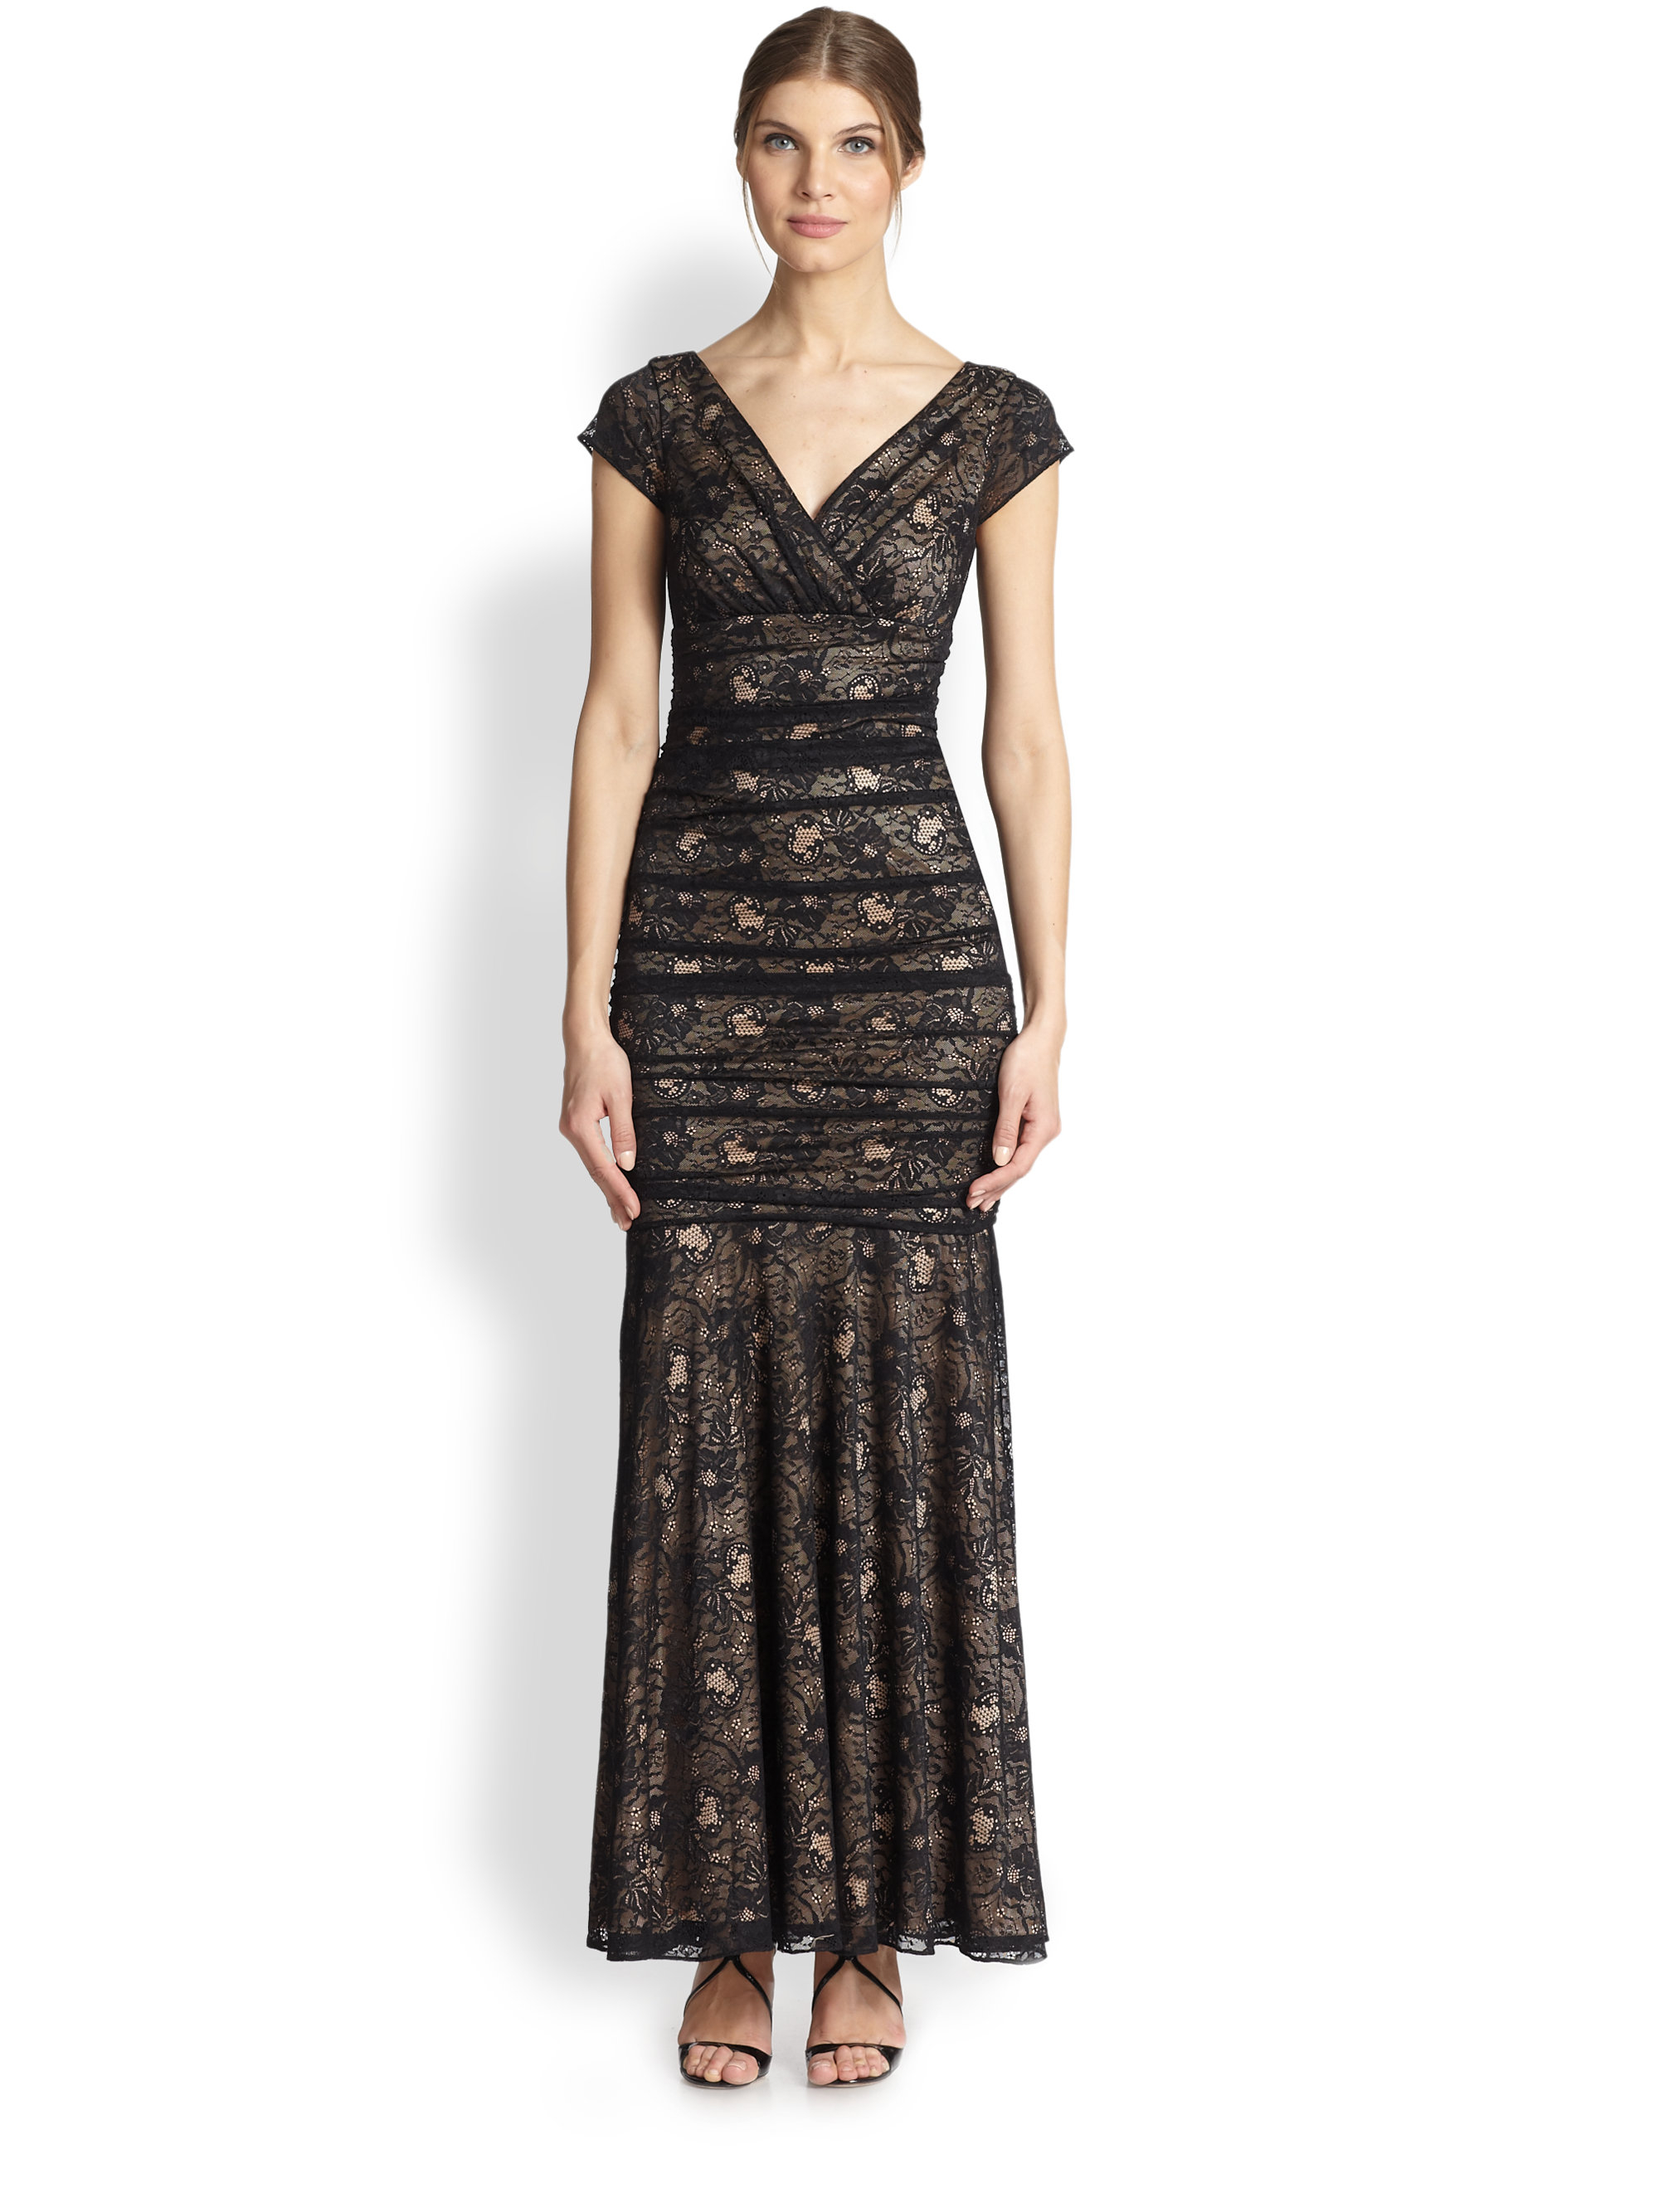 Saks Fifth Avenue Petite Evening Dresses - Plus Size Prom Dresses